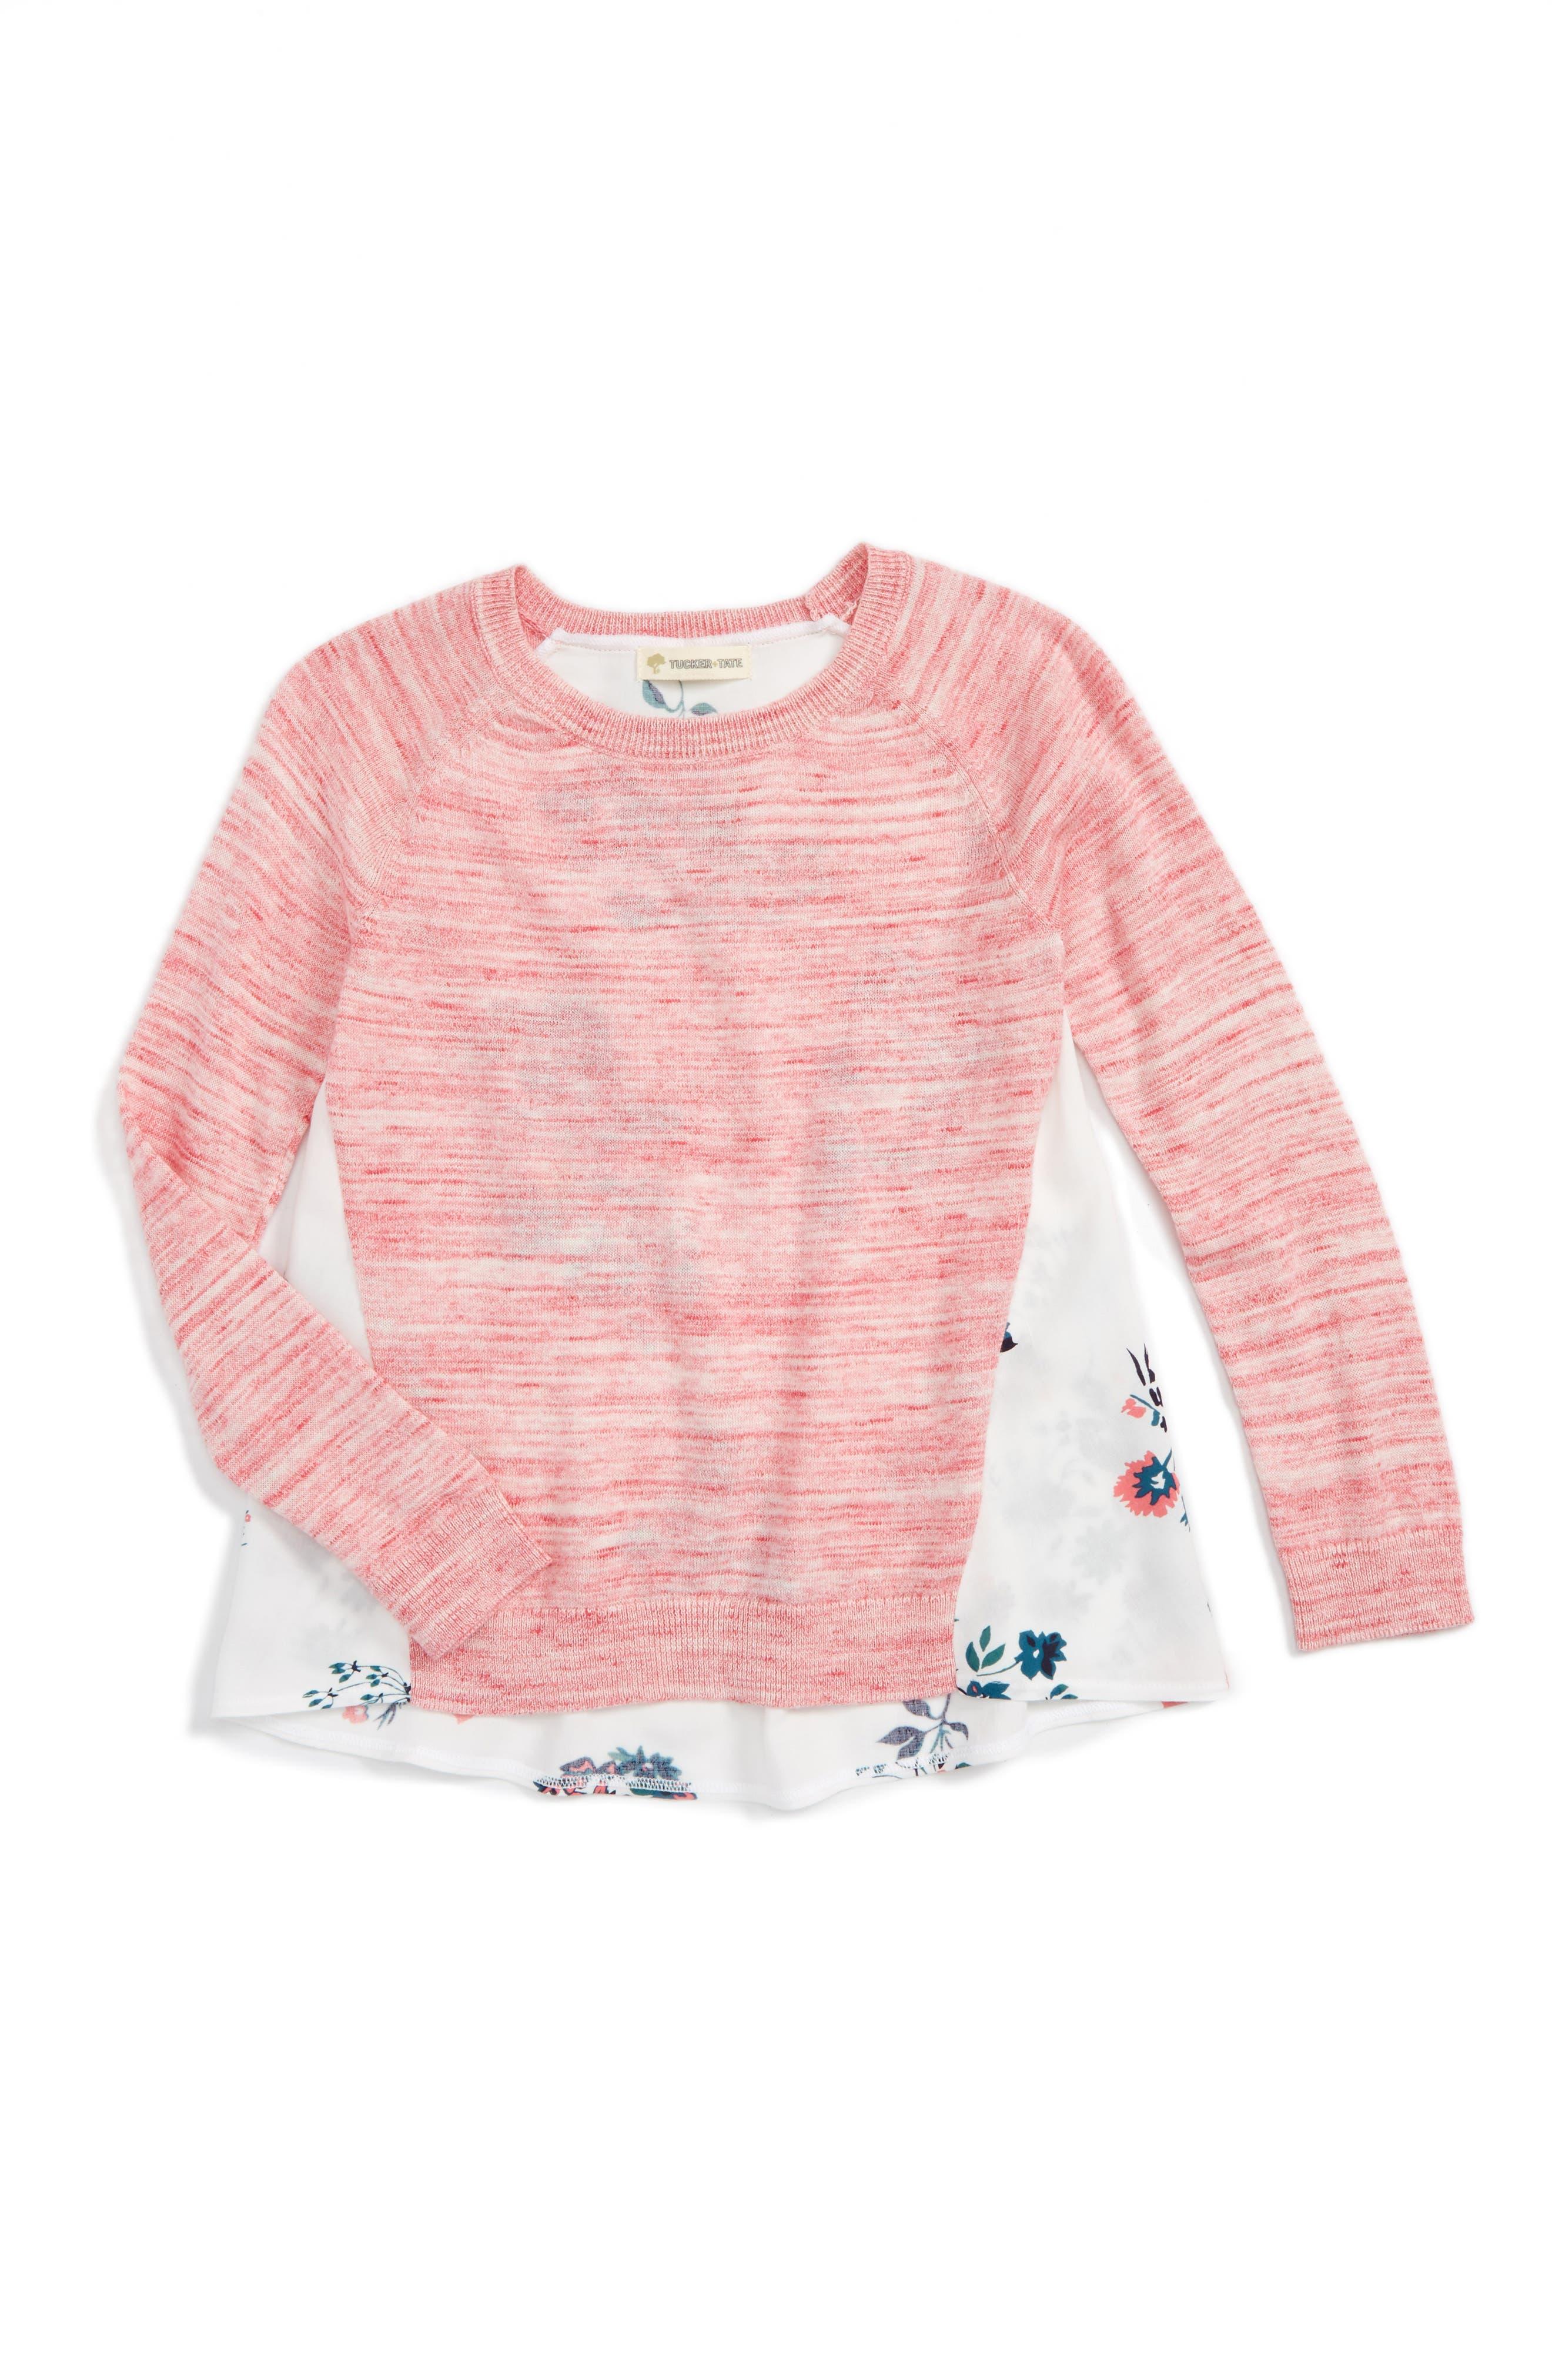 Tucker + Tate Mixed Media Sweater (Toddler Girls, Little Girls & Big Girls)